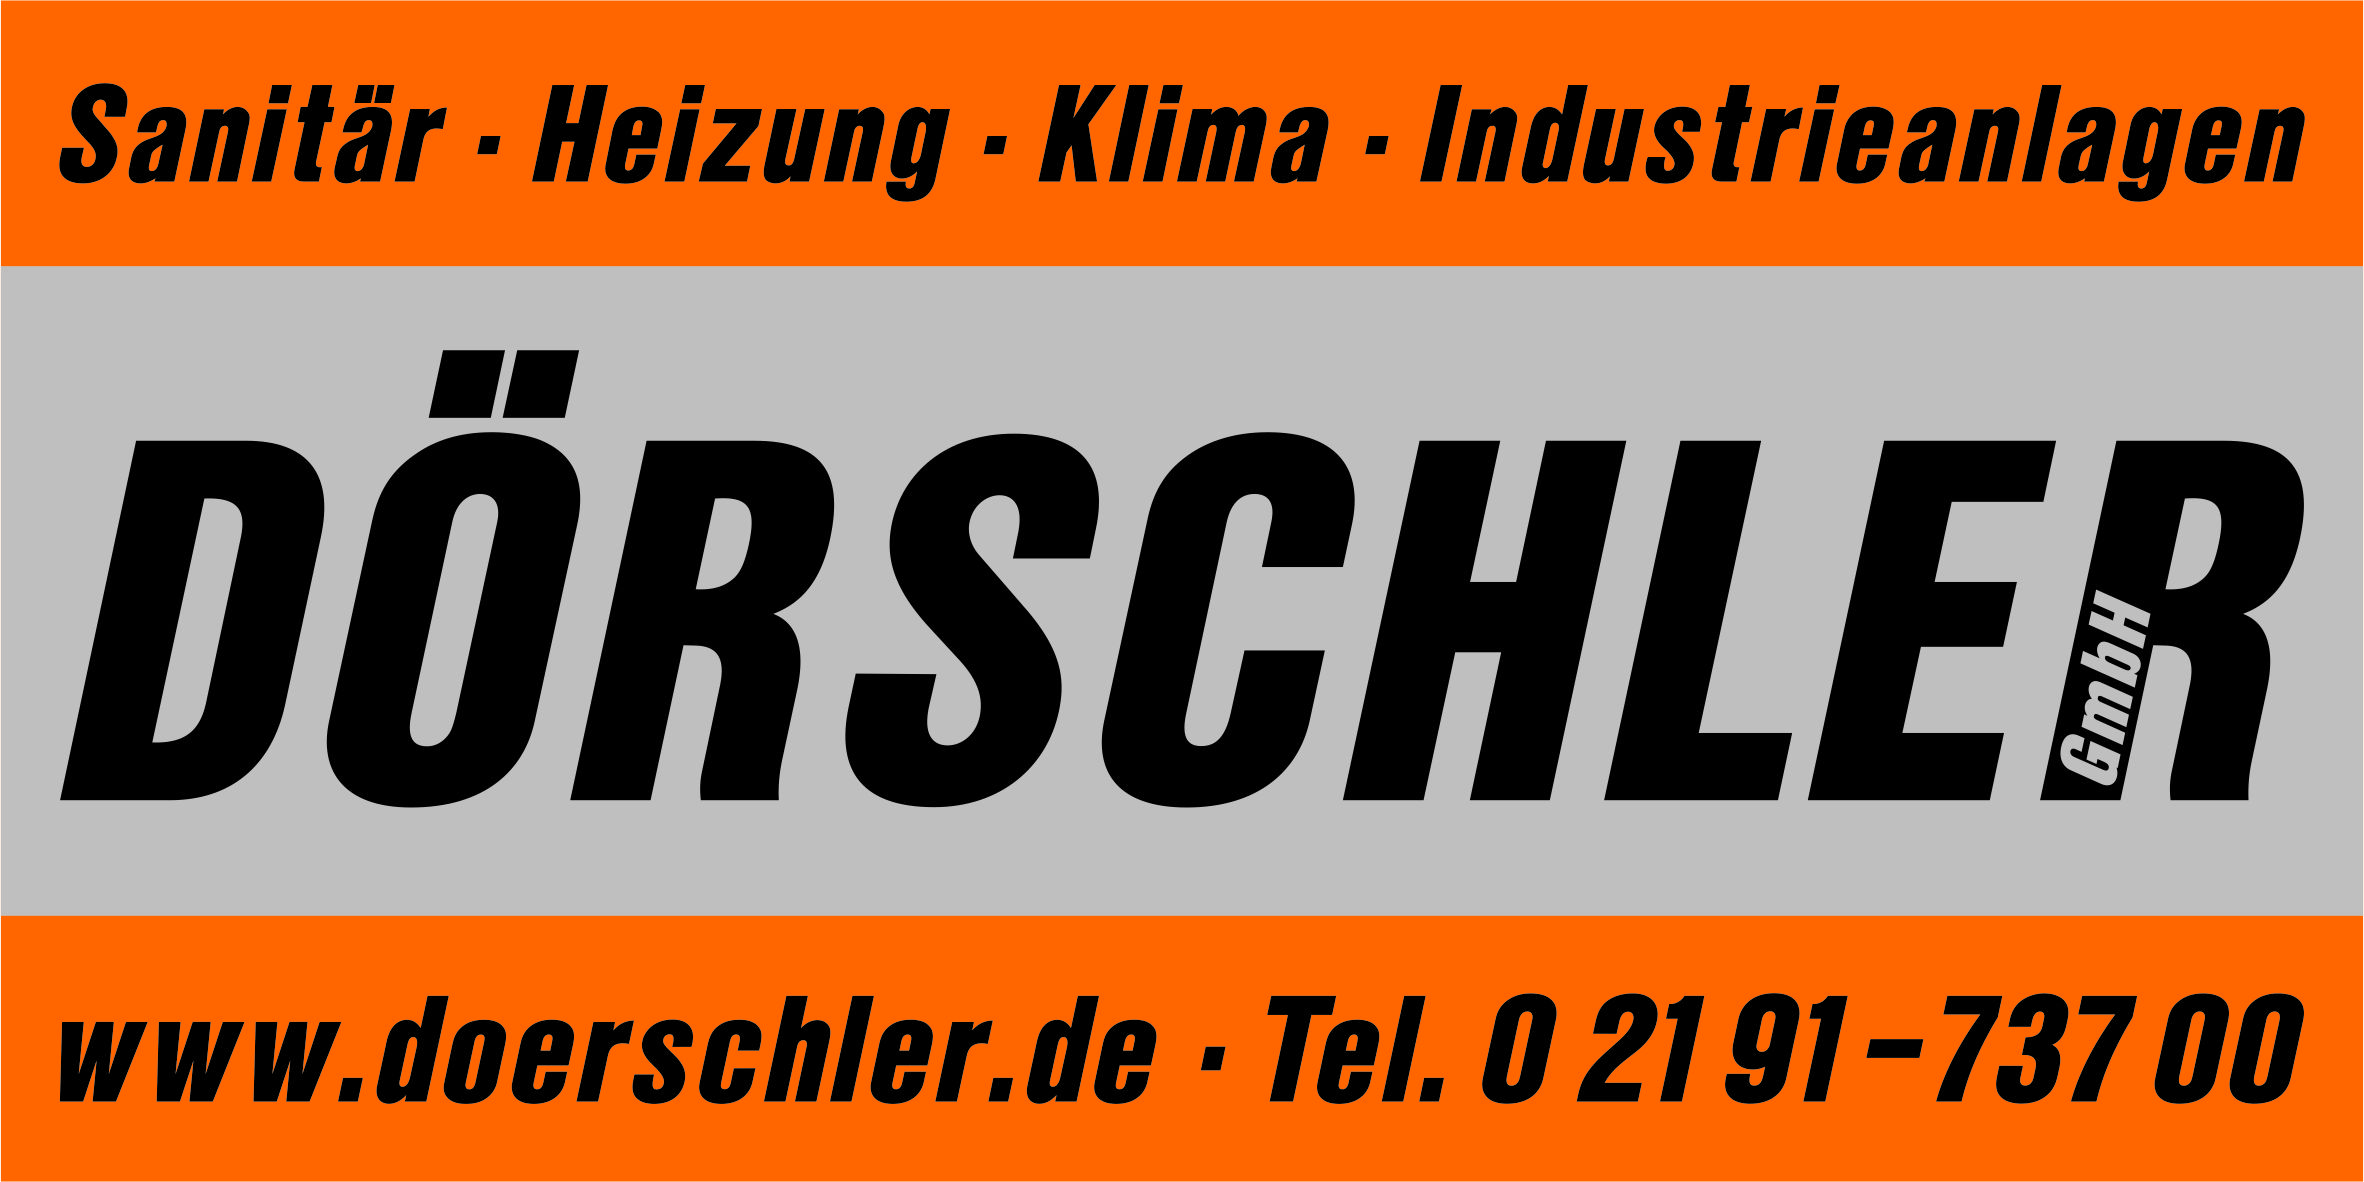 doerschler-logo-03_2012